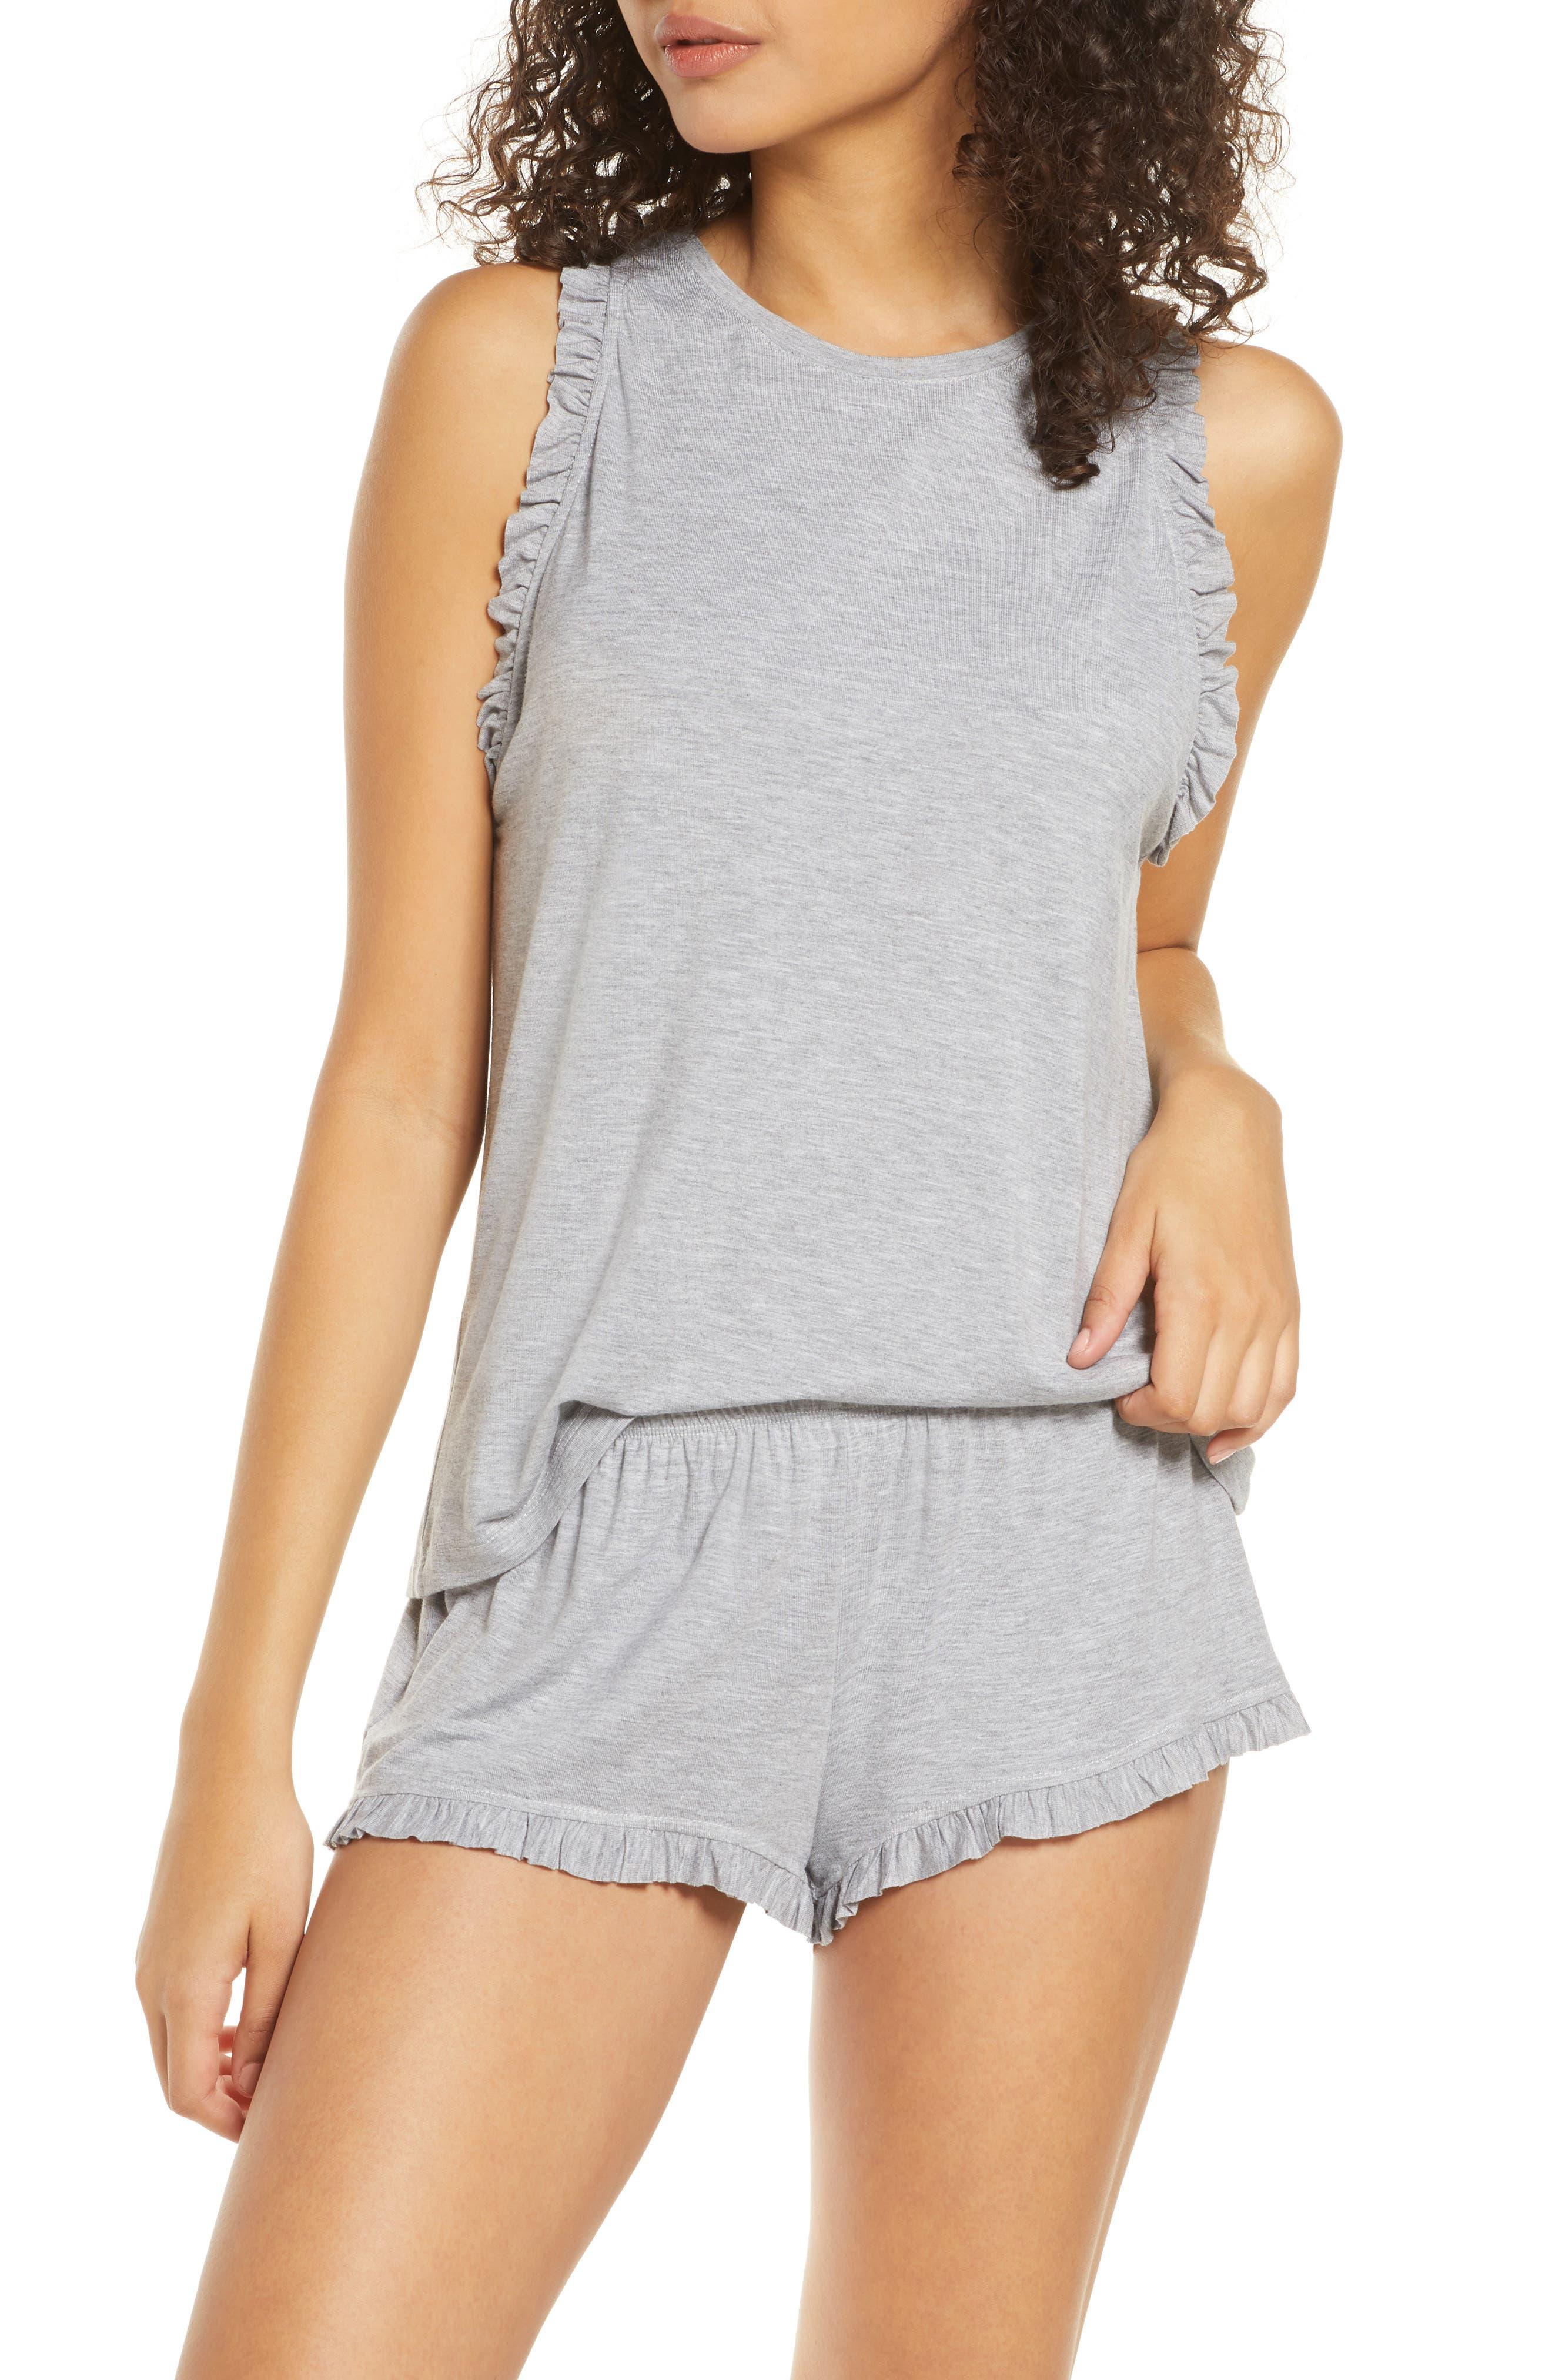 Ruthie Caravan Short Pajamas